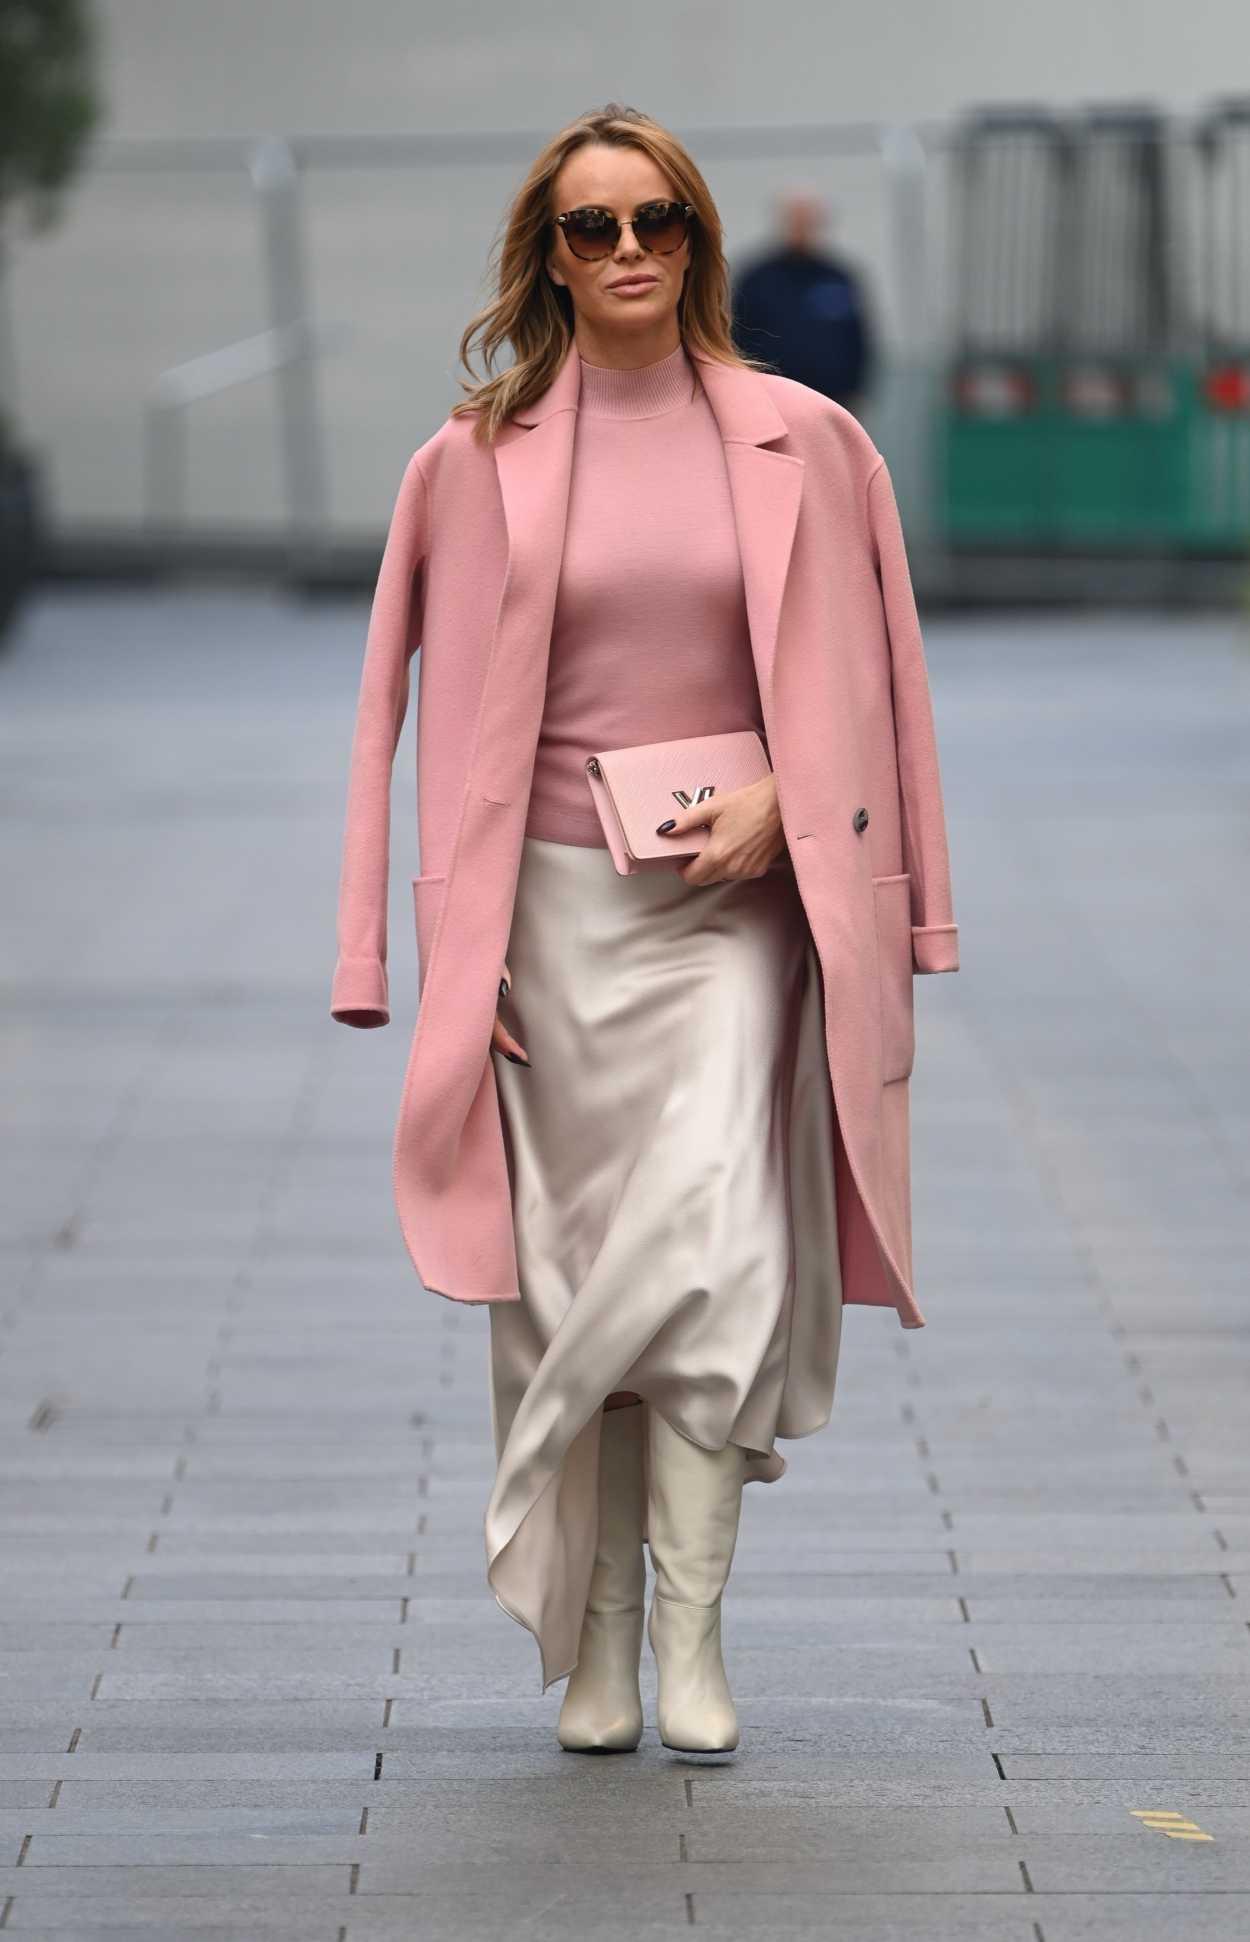 Amanda Holden in a Pink Coat